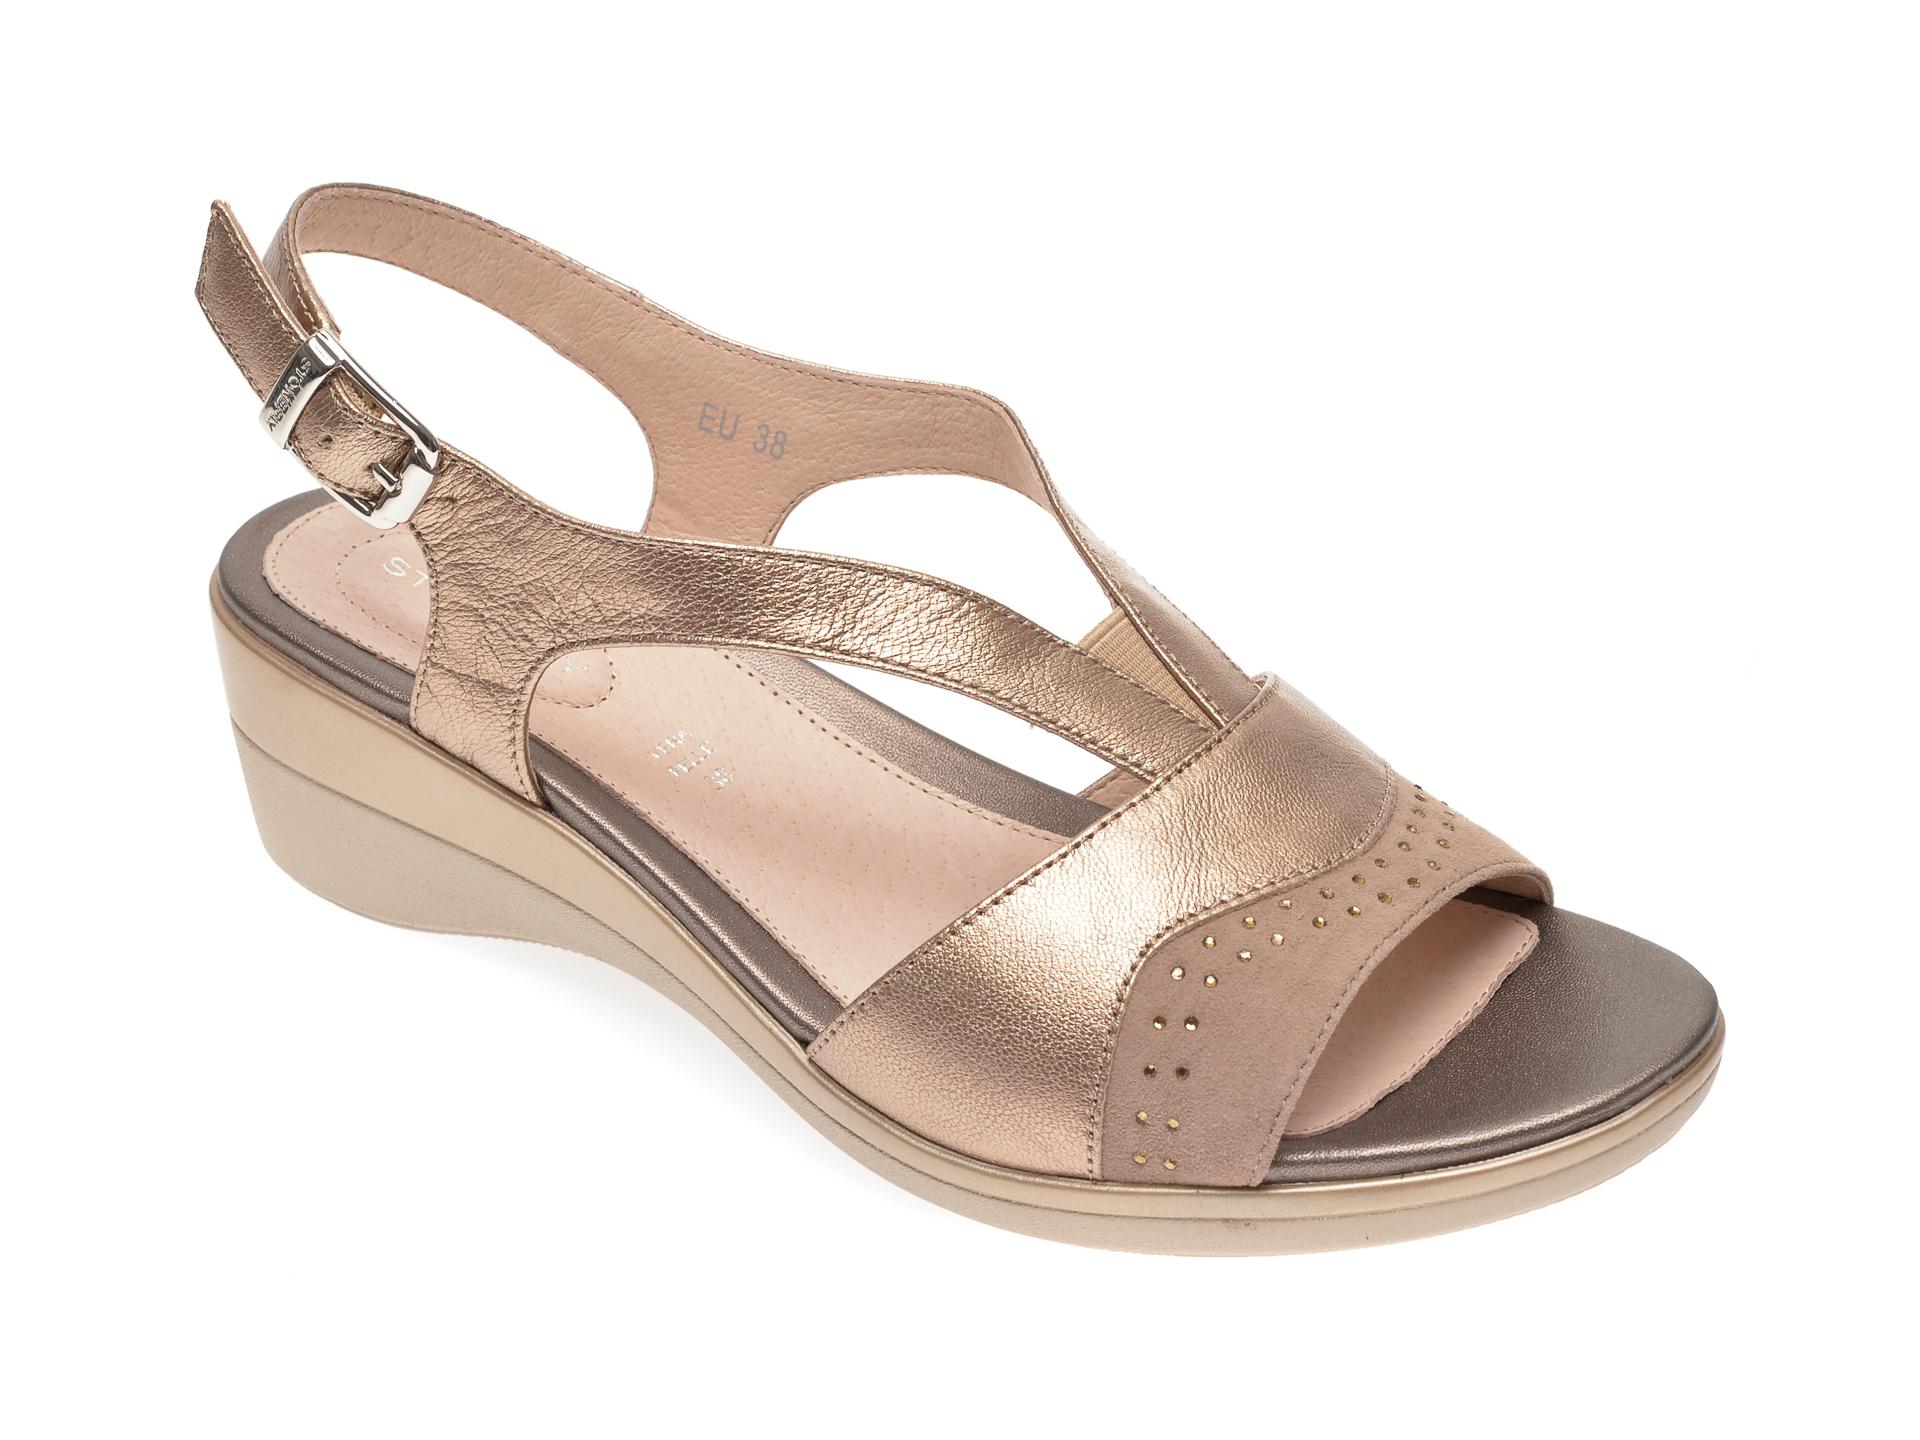 Sandale STONEFLY aurii, VANII22, din piele naturala